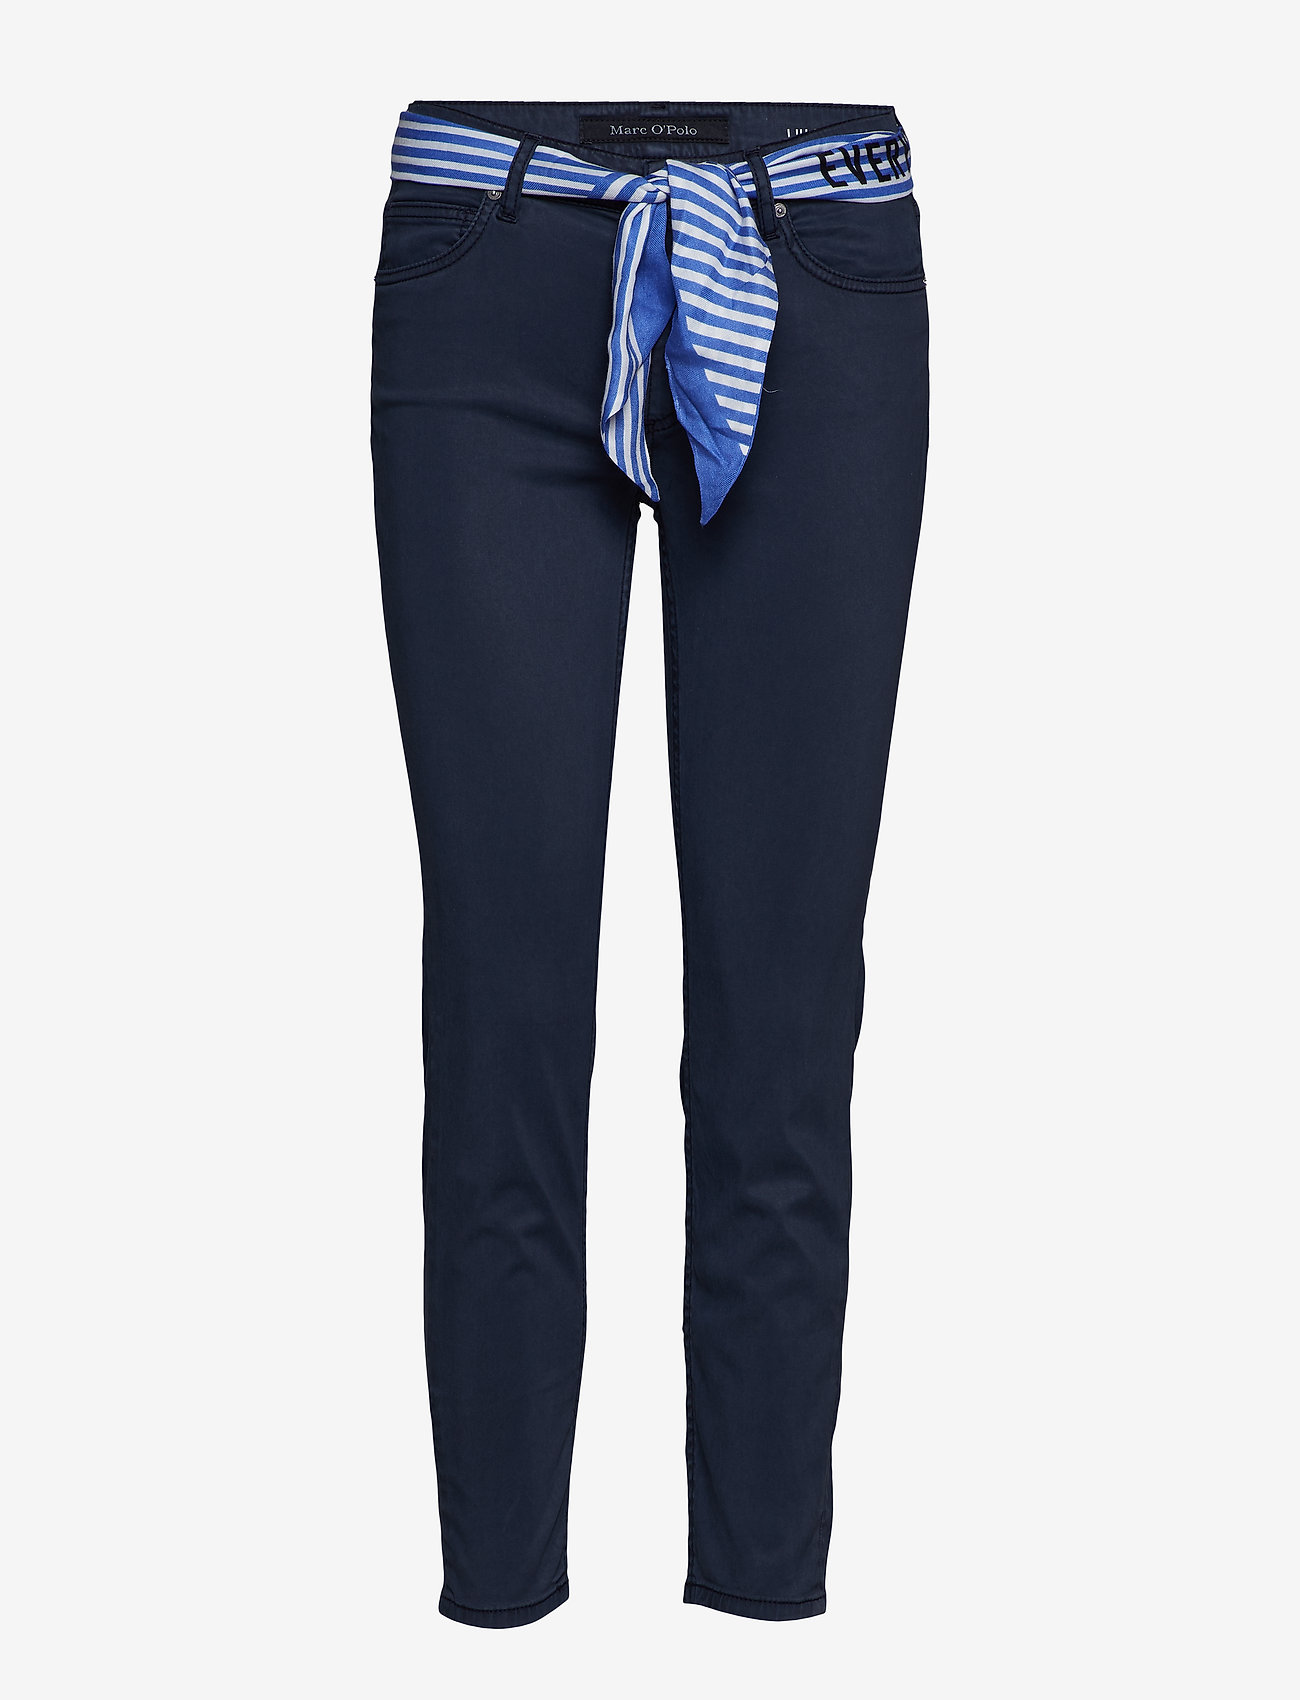 Marc O'Polo - Jeans - skinny jeans - deep atlantic - 0